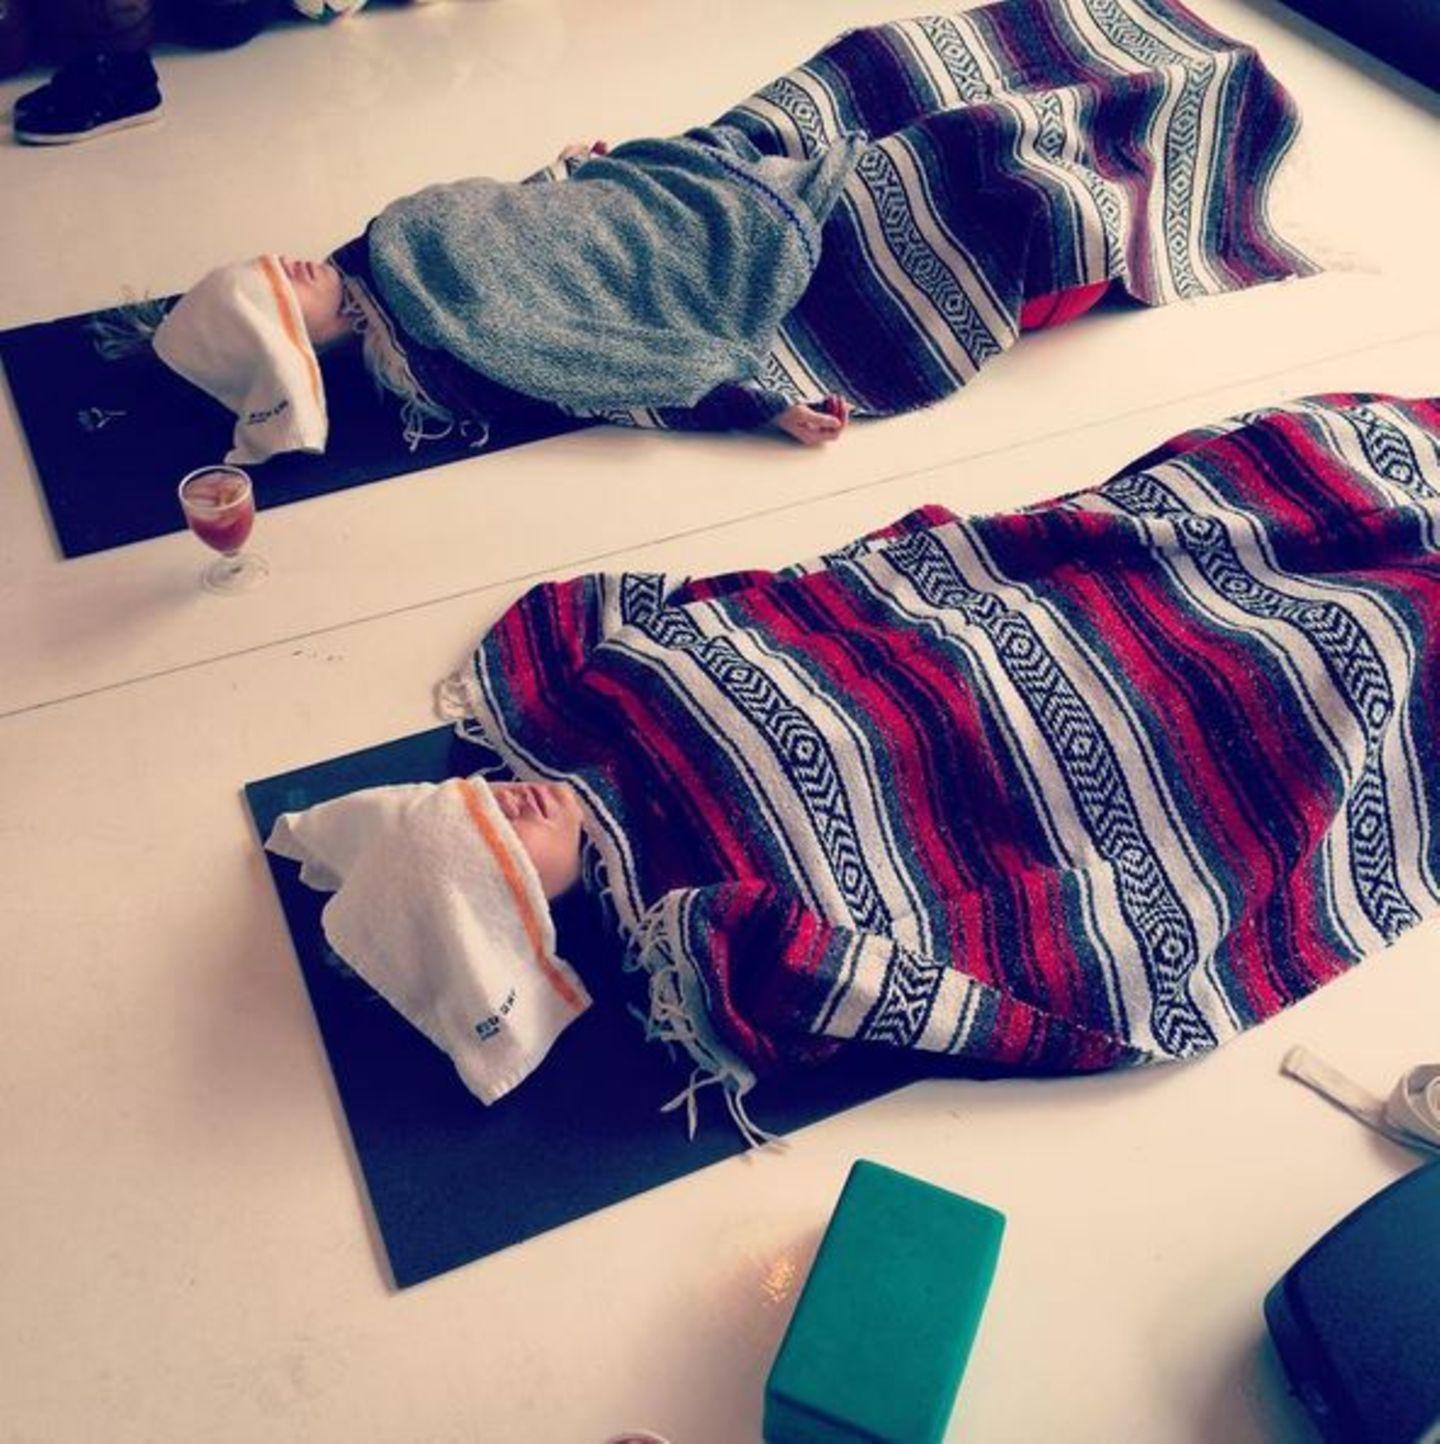 Januar 2016  Suki Waterhouse relaxt ein wenig nach dem Yoga.